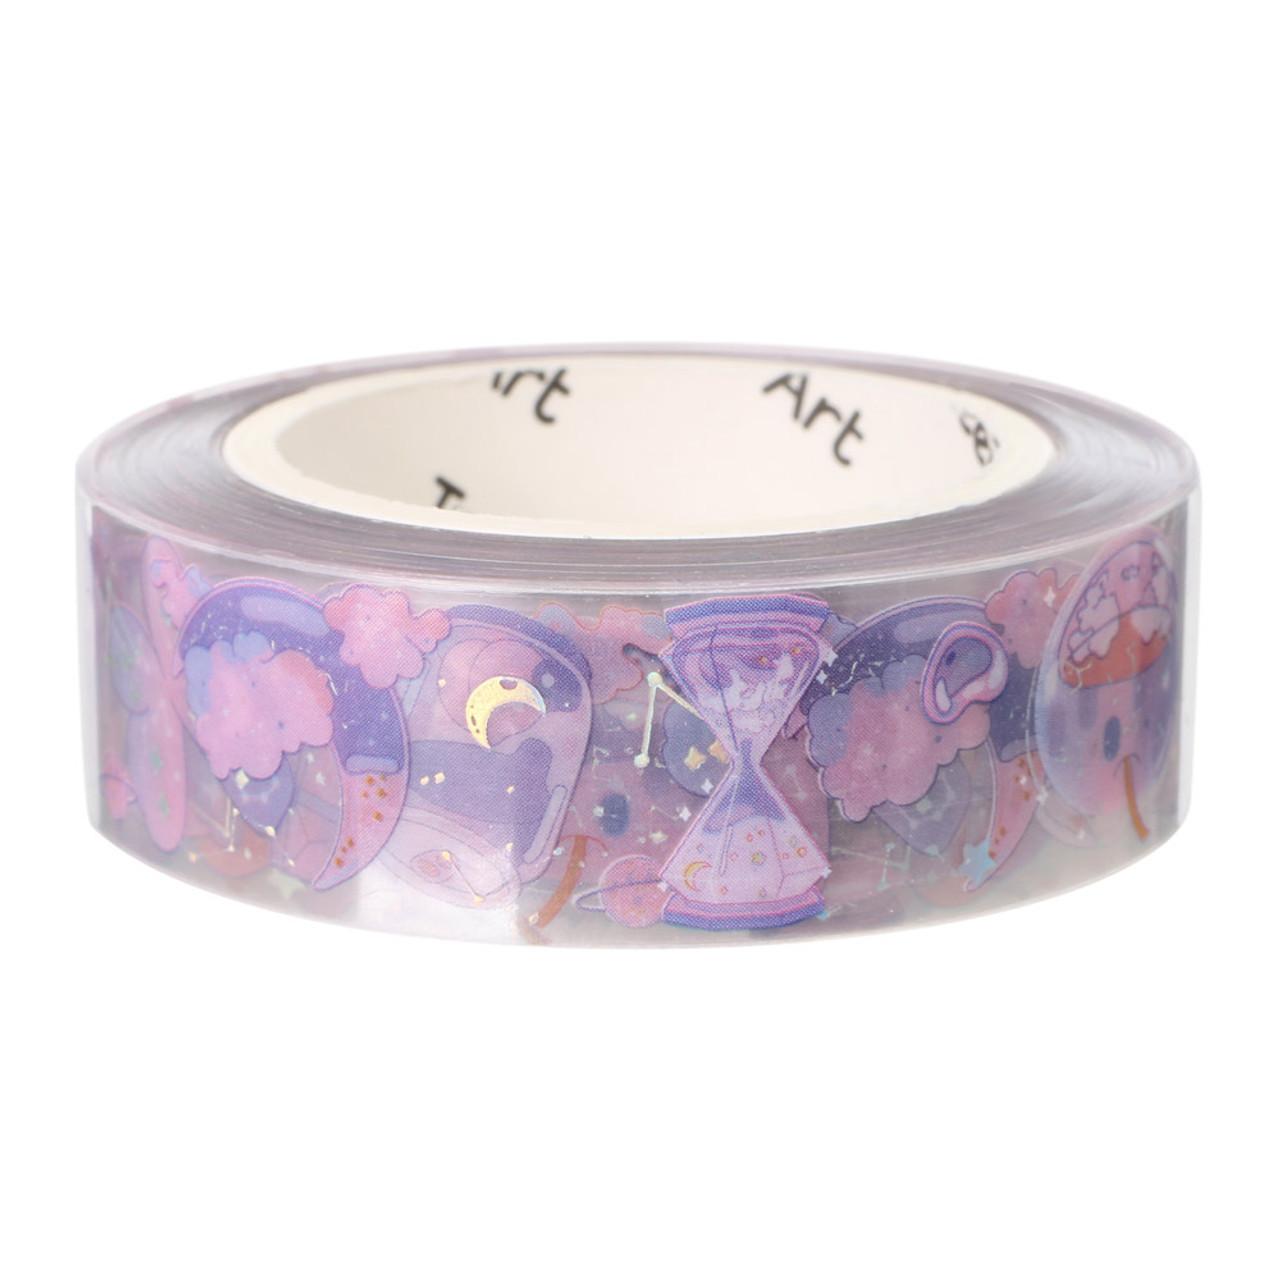 Crystals Age PET Masking Tape - Tea ( Deco Tape )